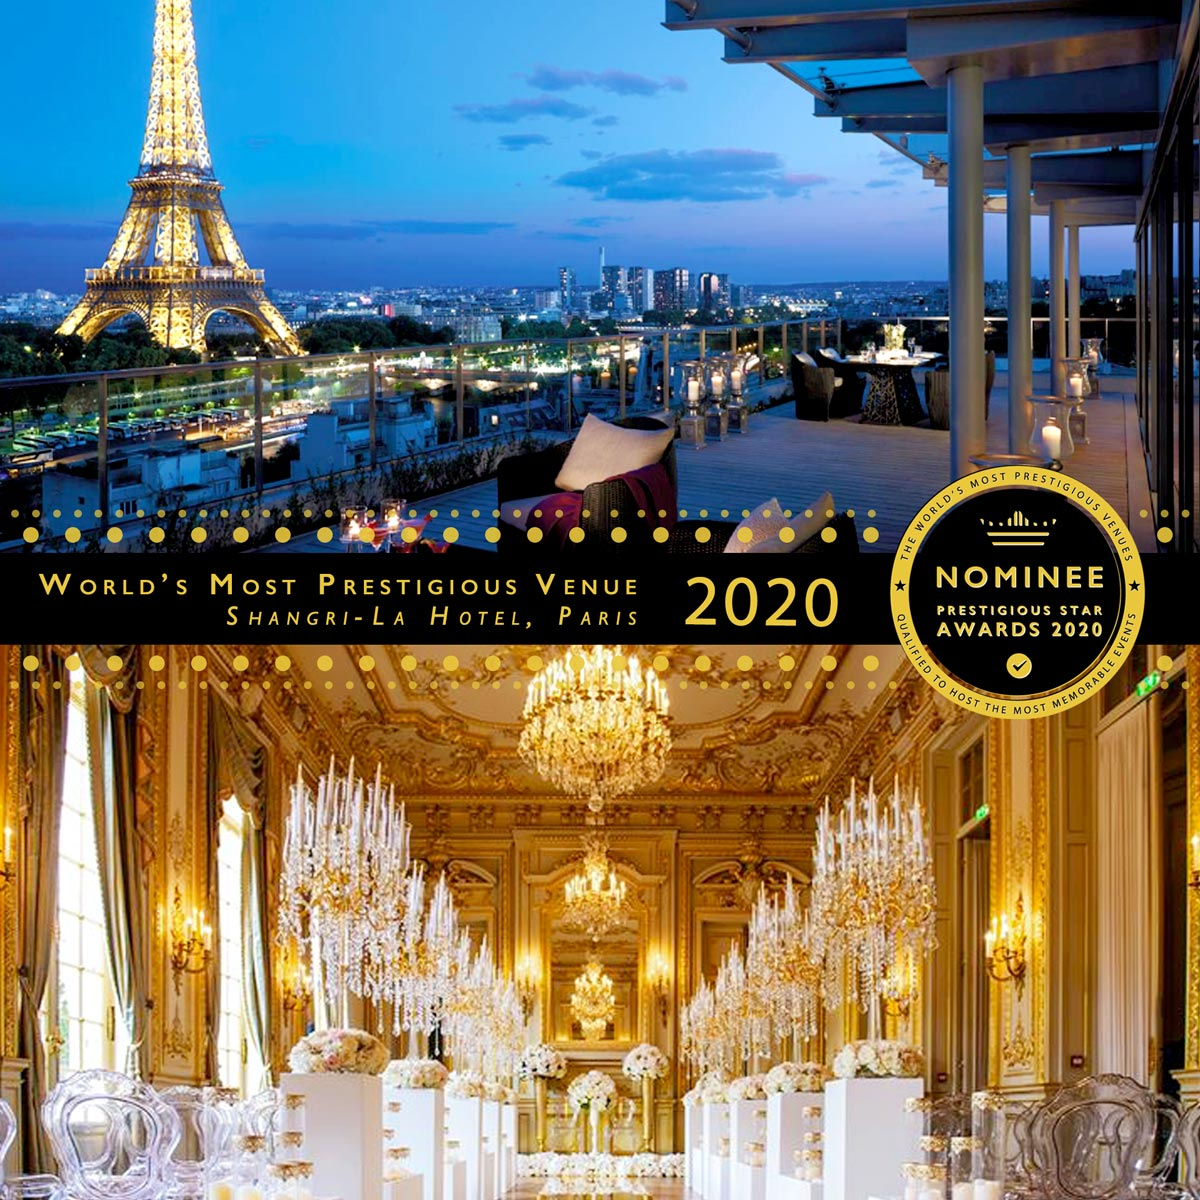 Le Grand Salon Function Room at Shangri-La Hotel, Paris